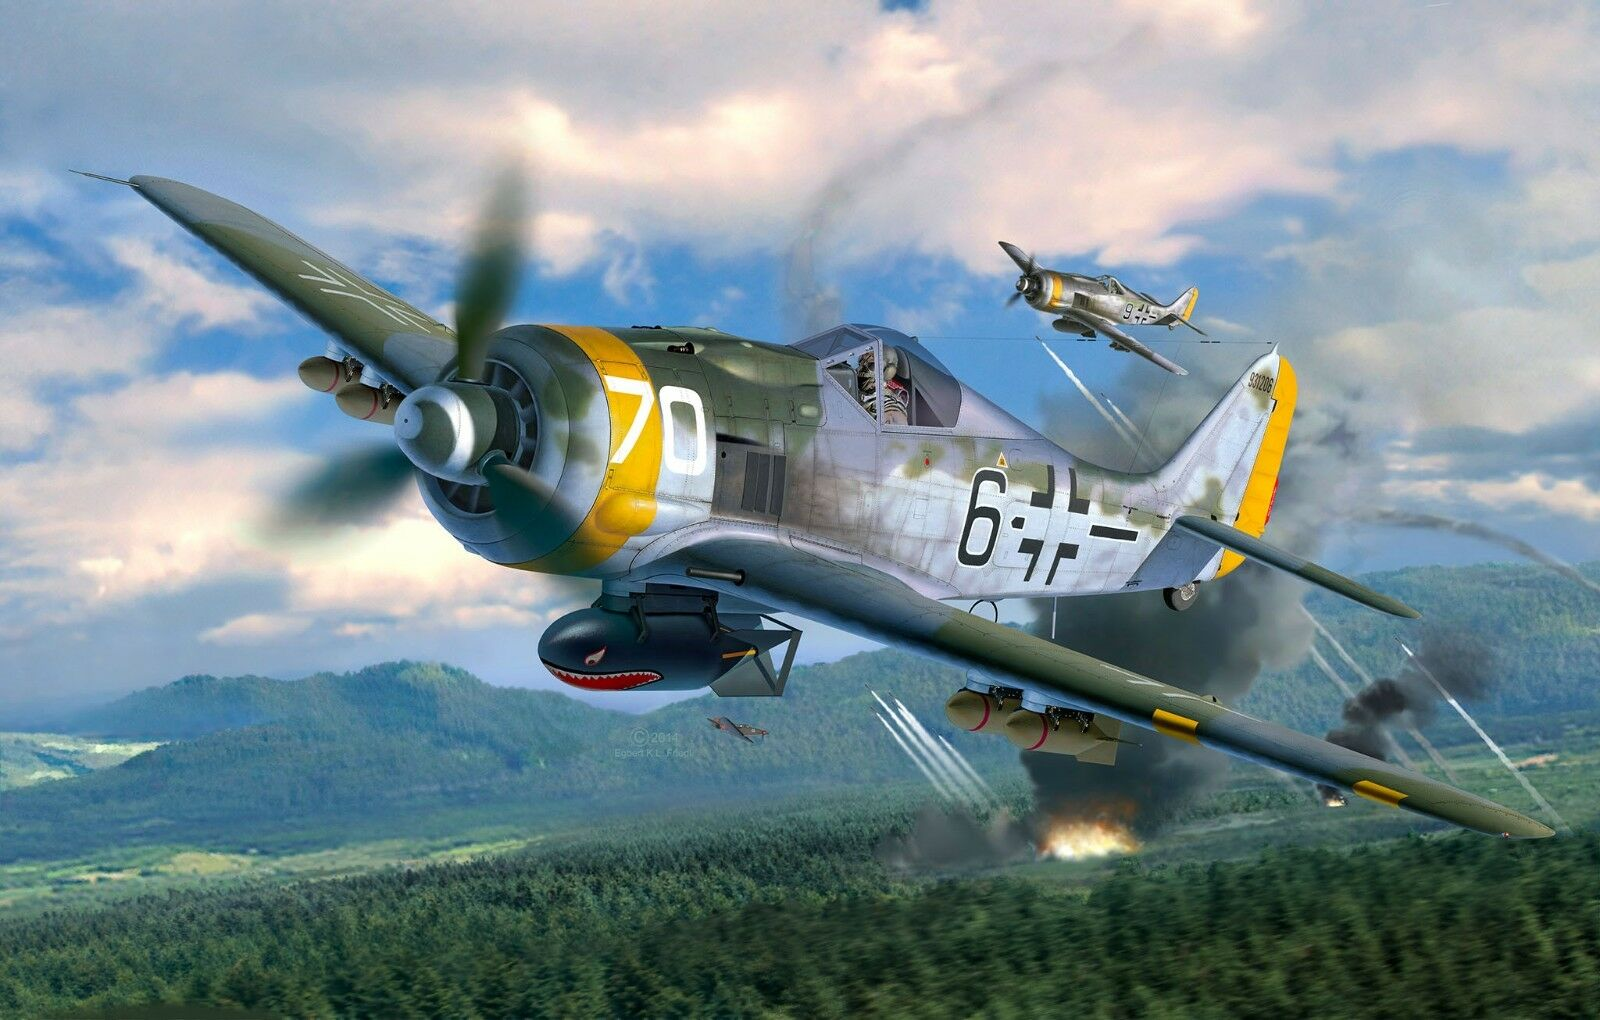 Revell 04869 Focke Wulf Fw 190F-8 Kit de Plástico 1 32 Escala con Rastreo 48